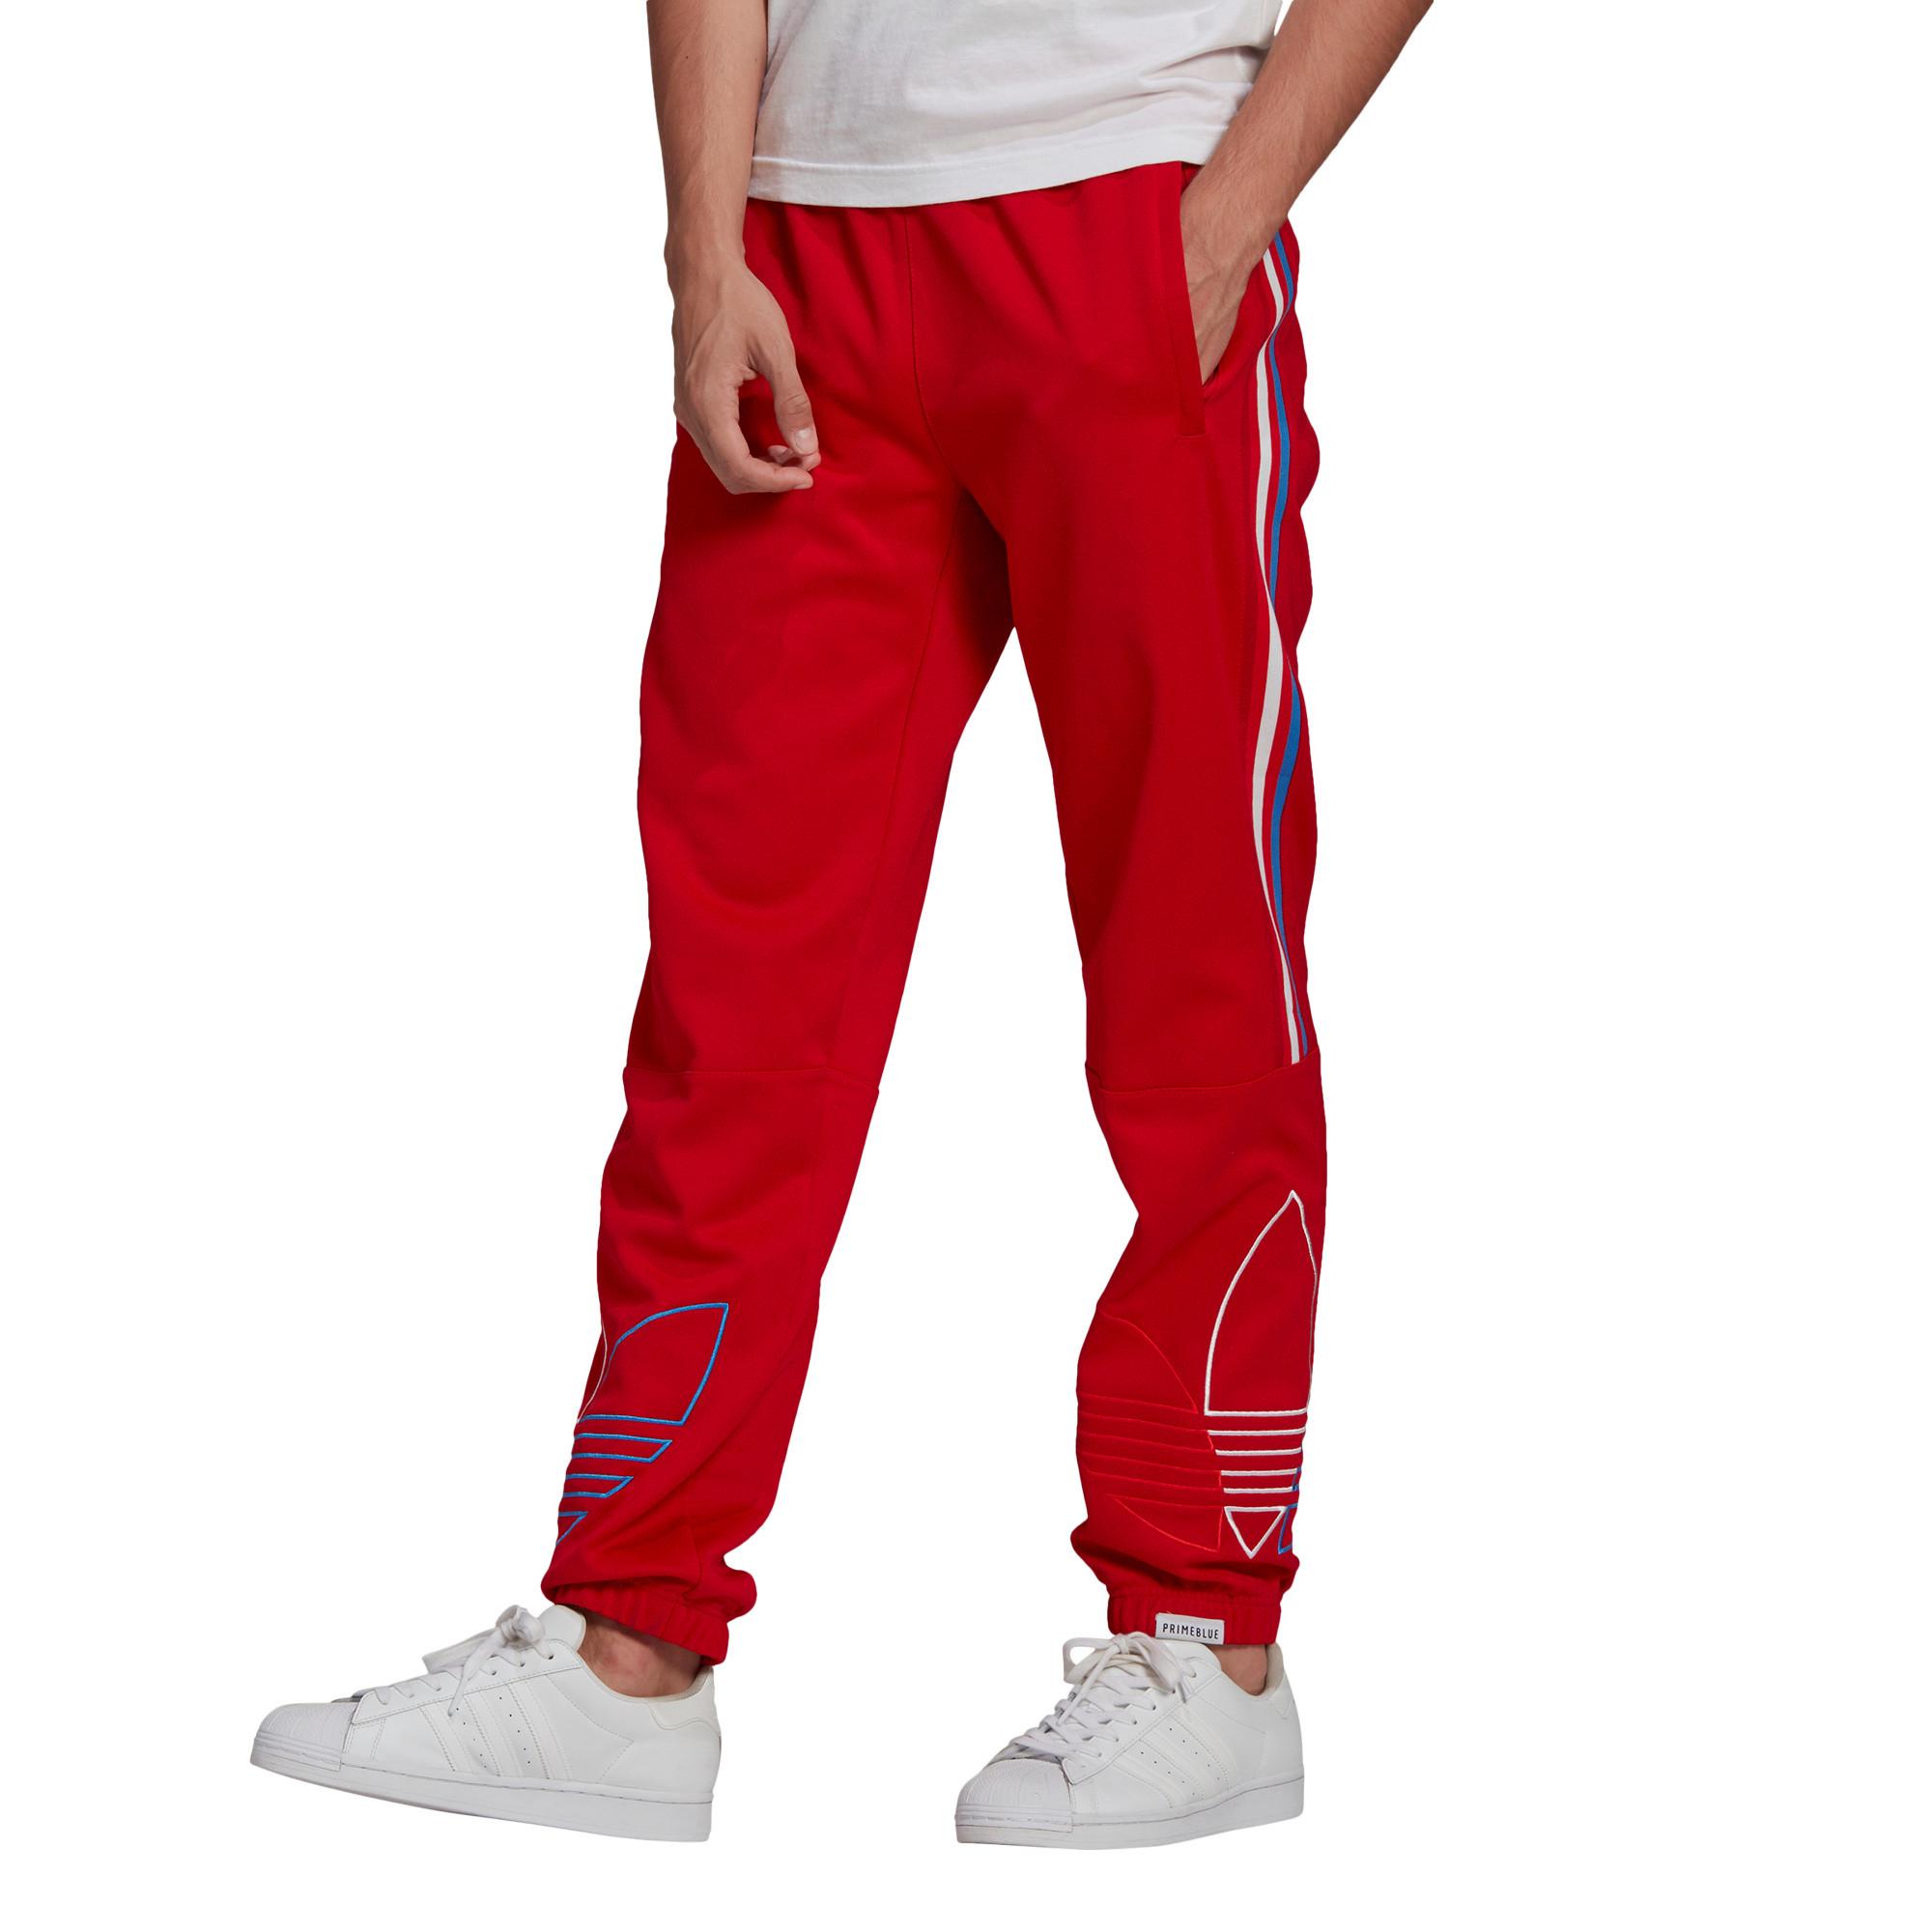 Pantaloni tuta adicolor, Rosso, large image number 1